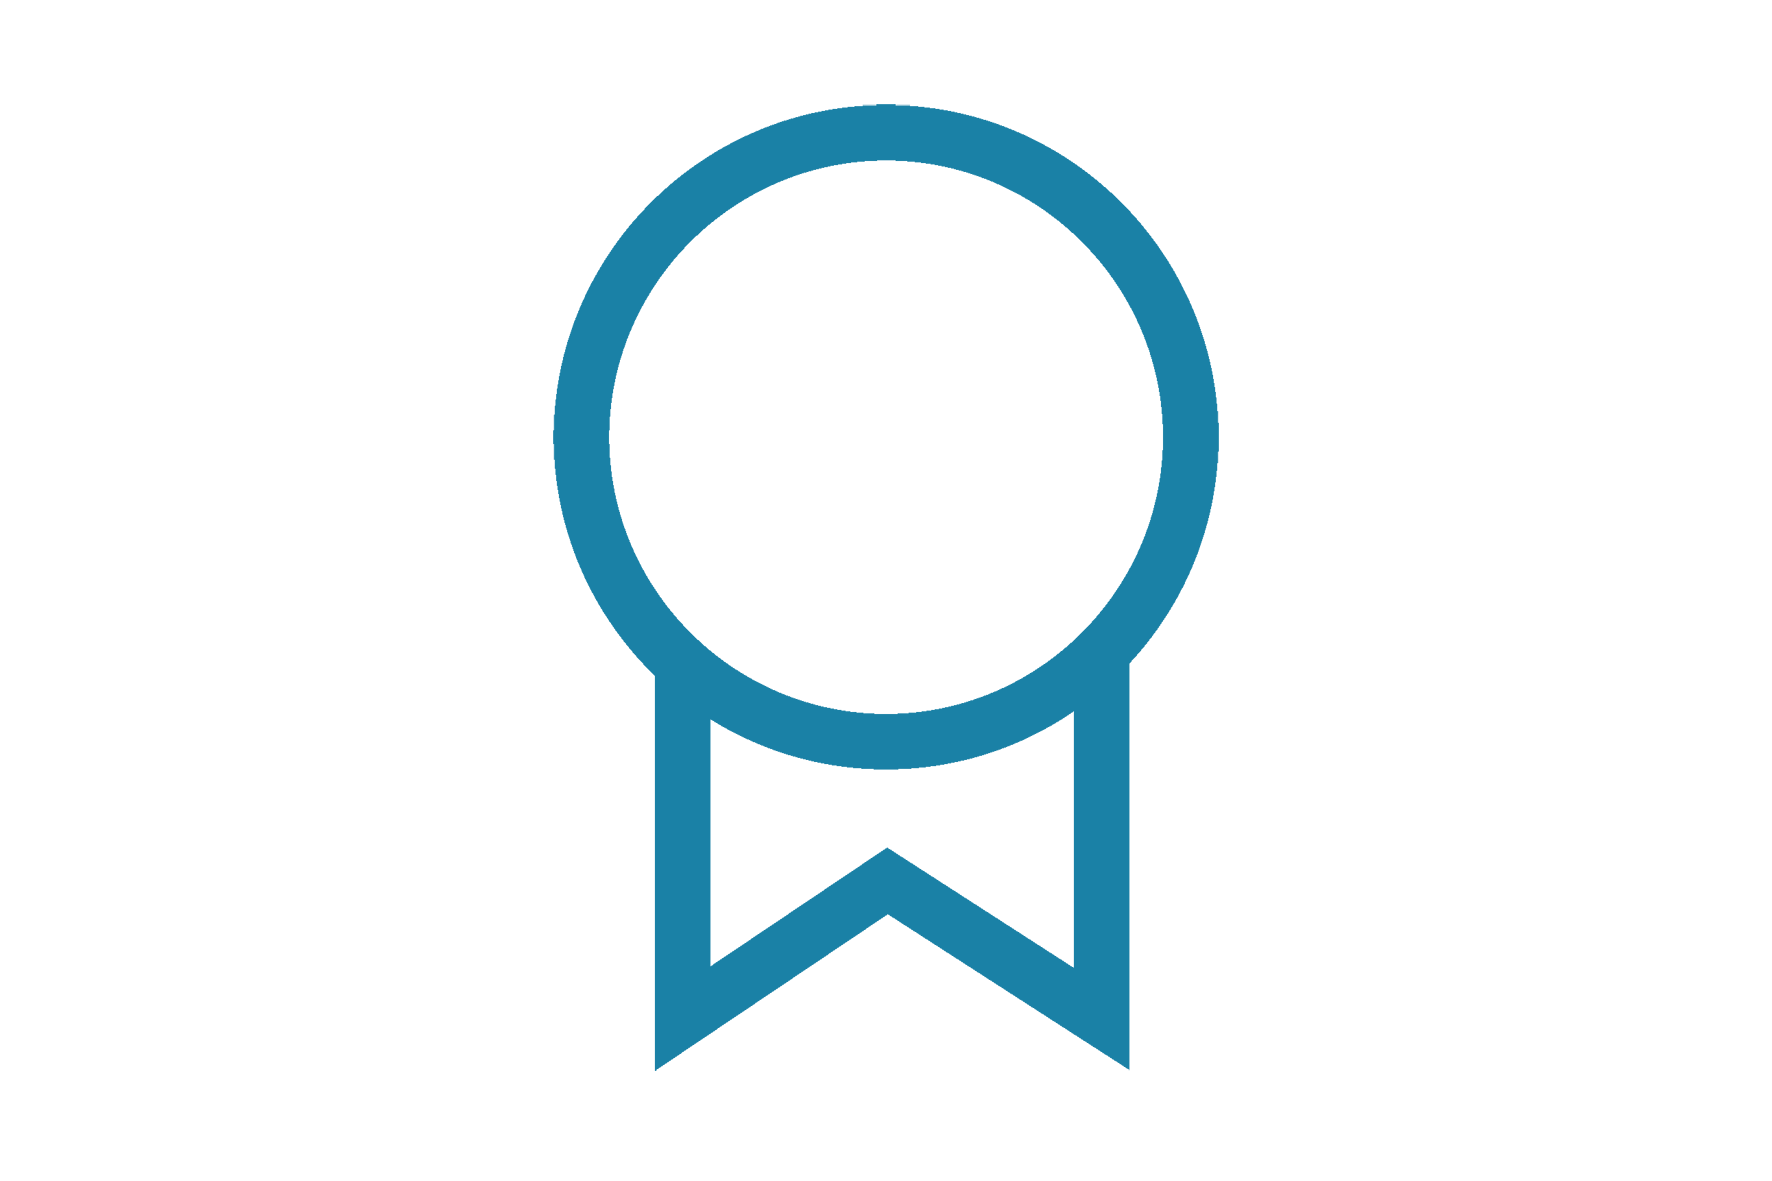 IM_icon_blue_Quality.png